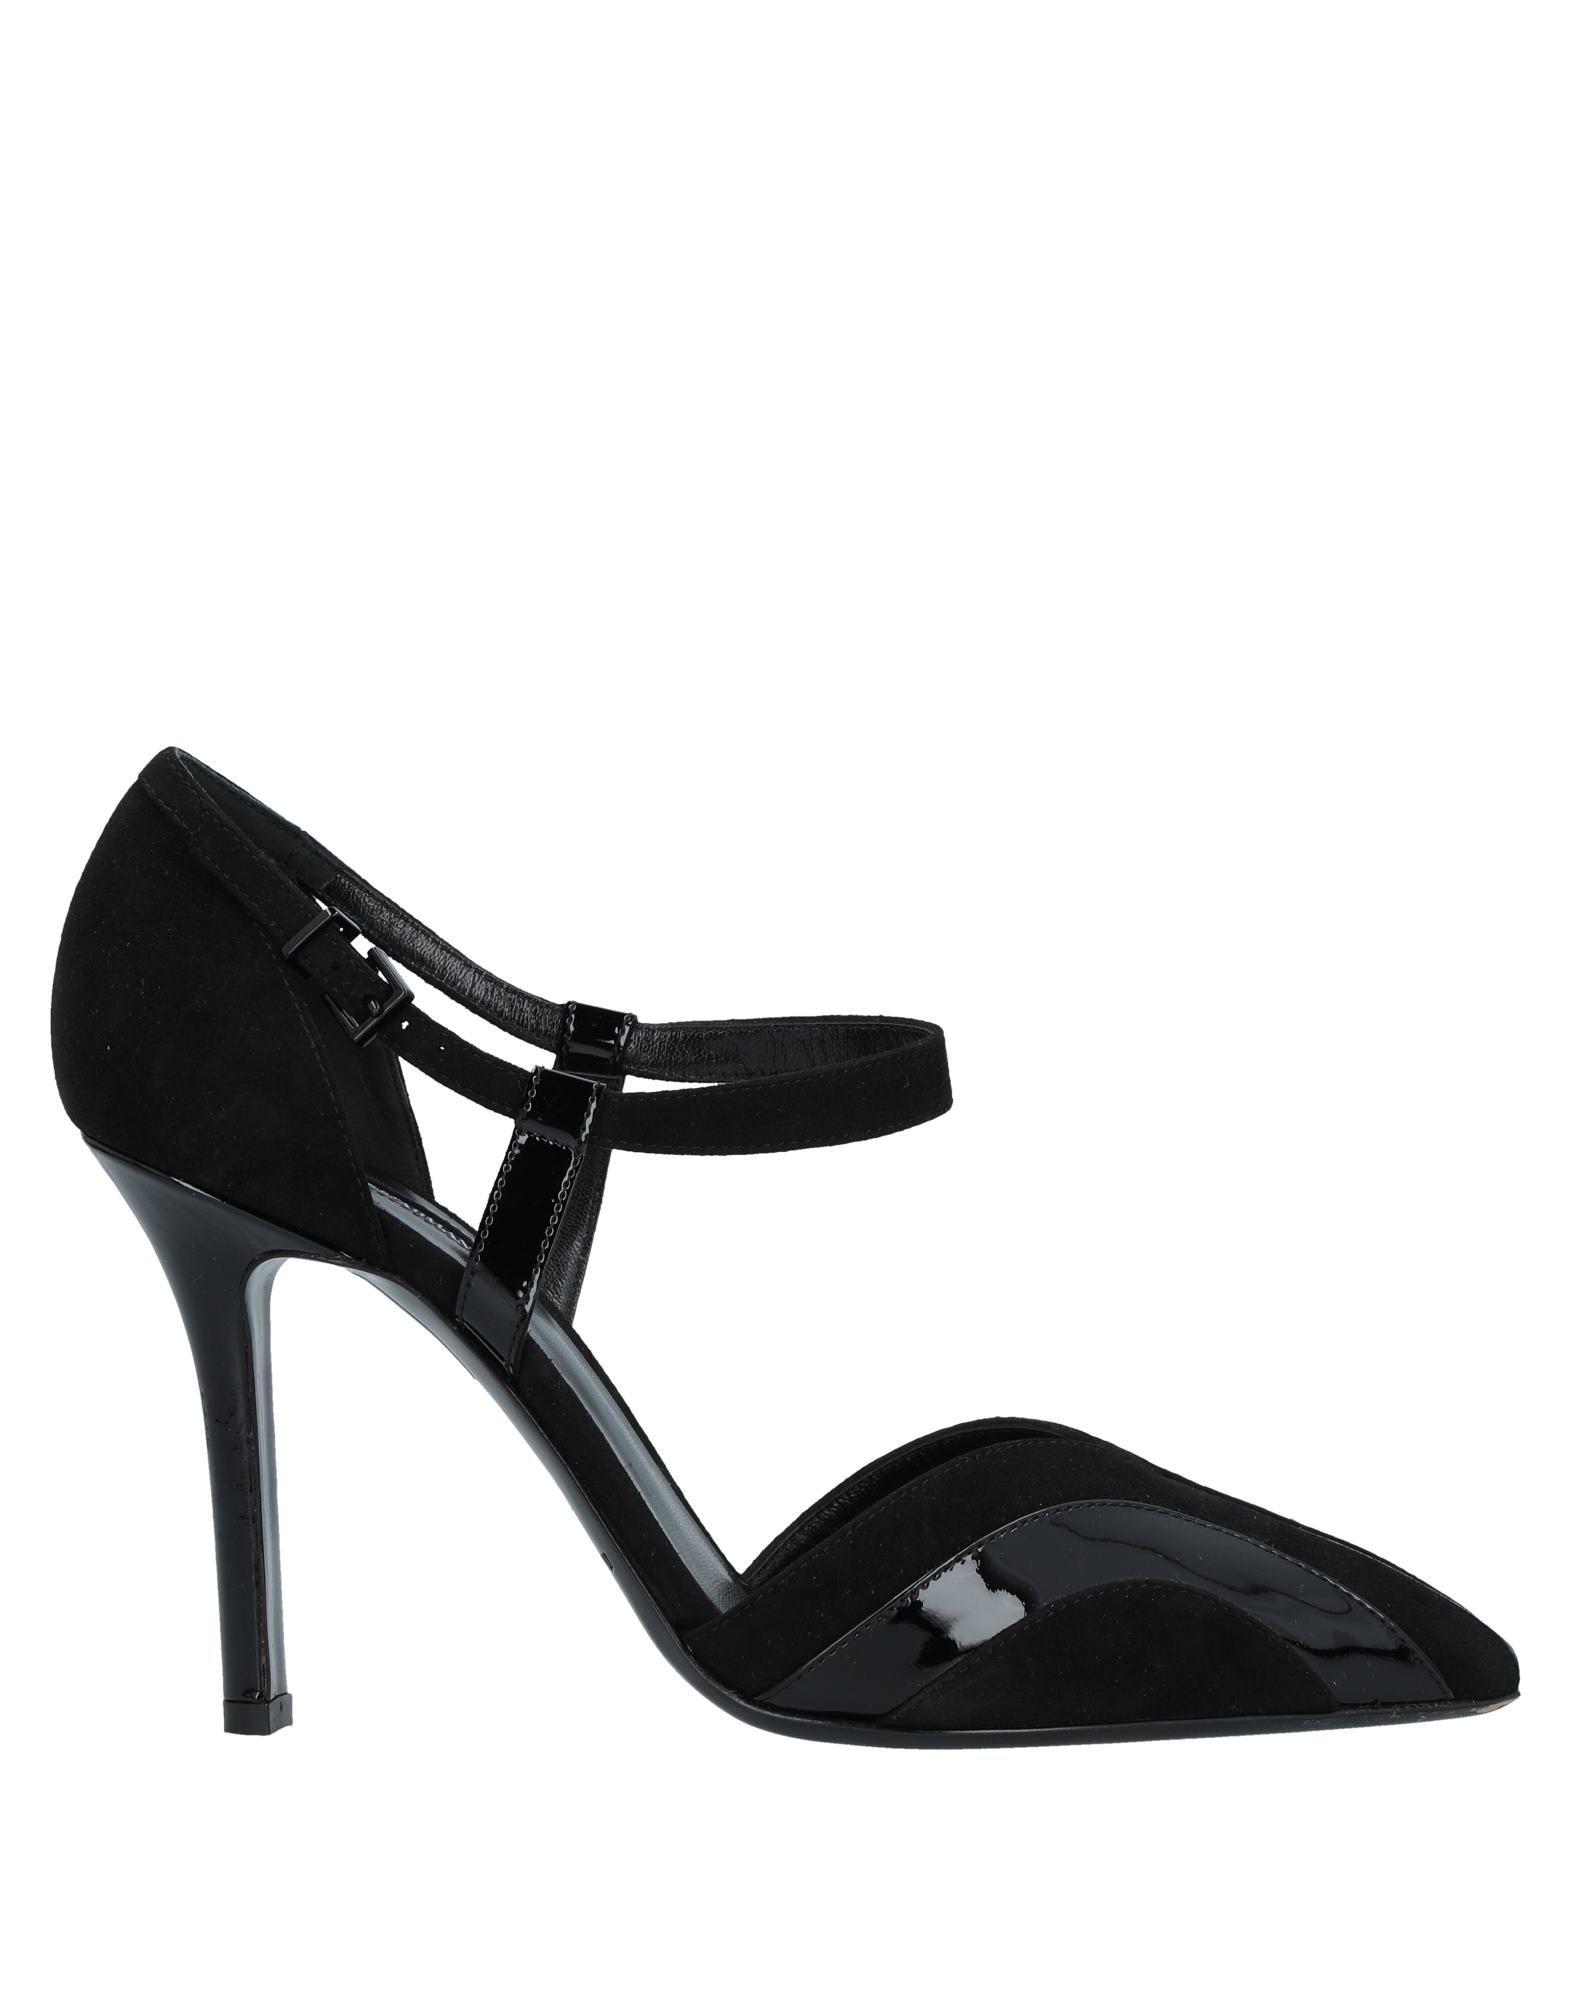 Rabatt Damen Schuhe Emporio Armani Pumps Damen Rabatt  11523566SQ 5e6421